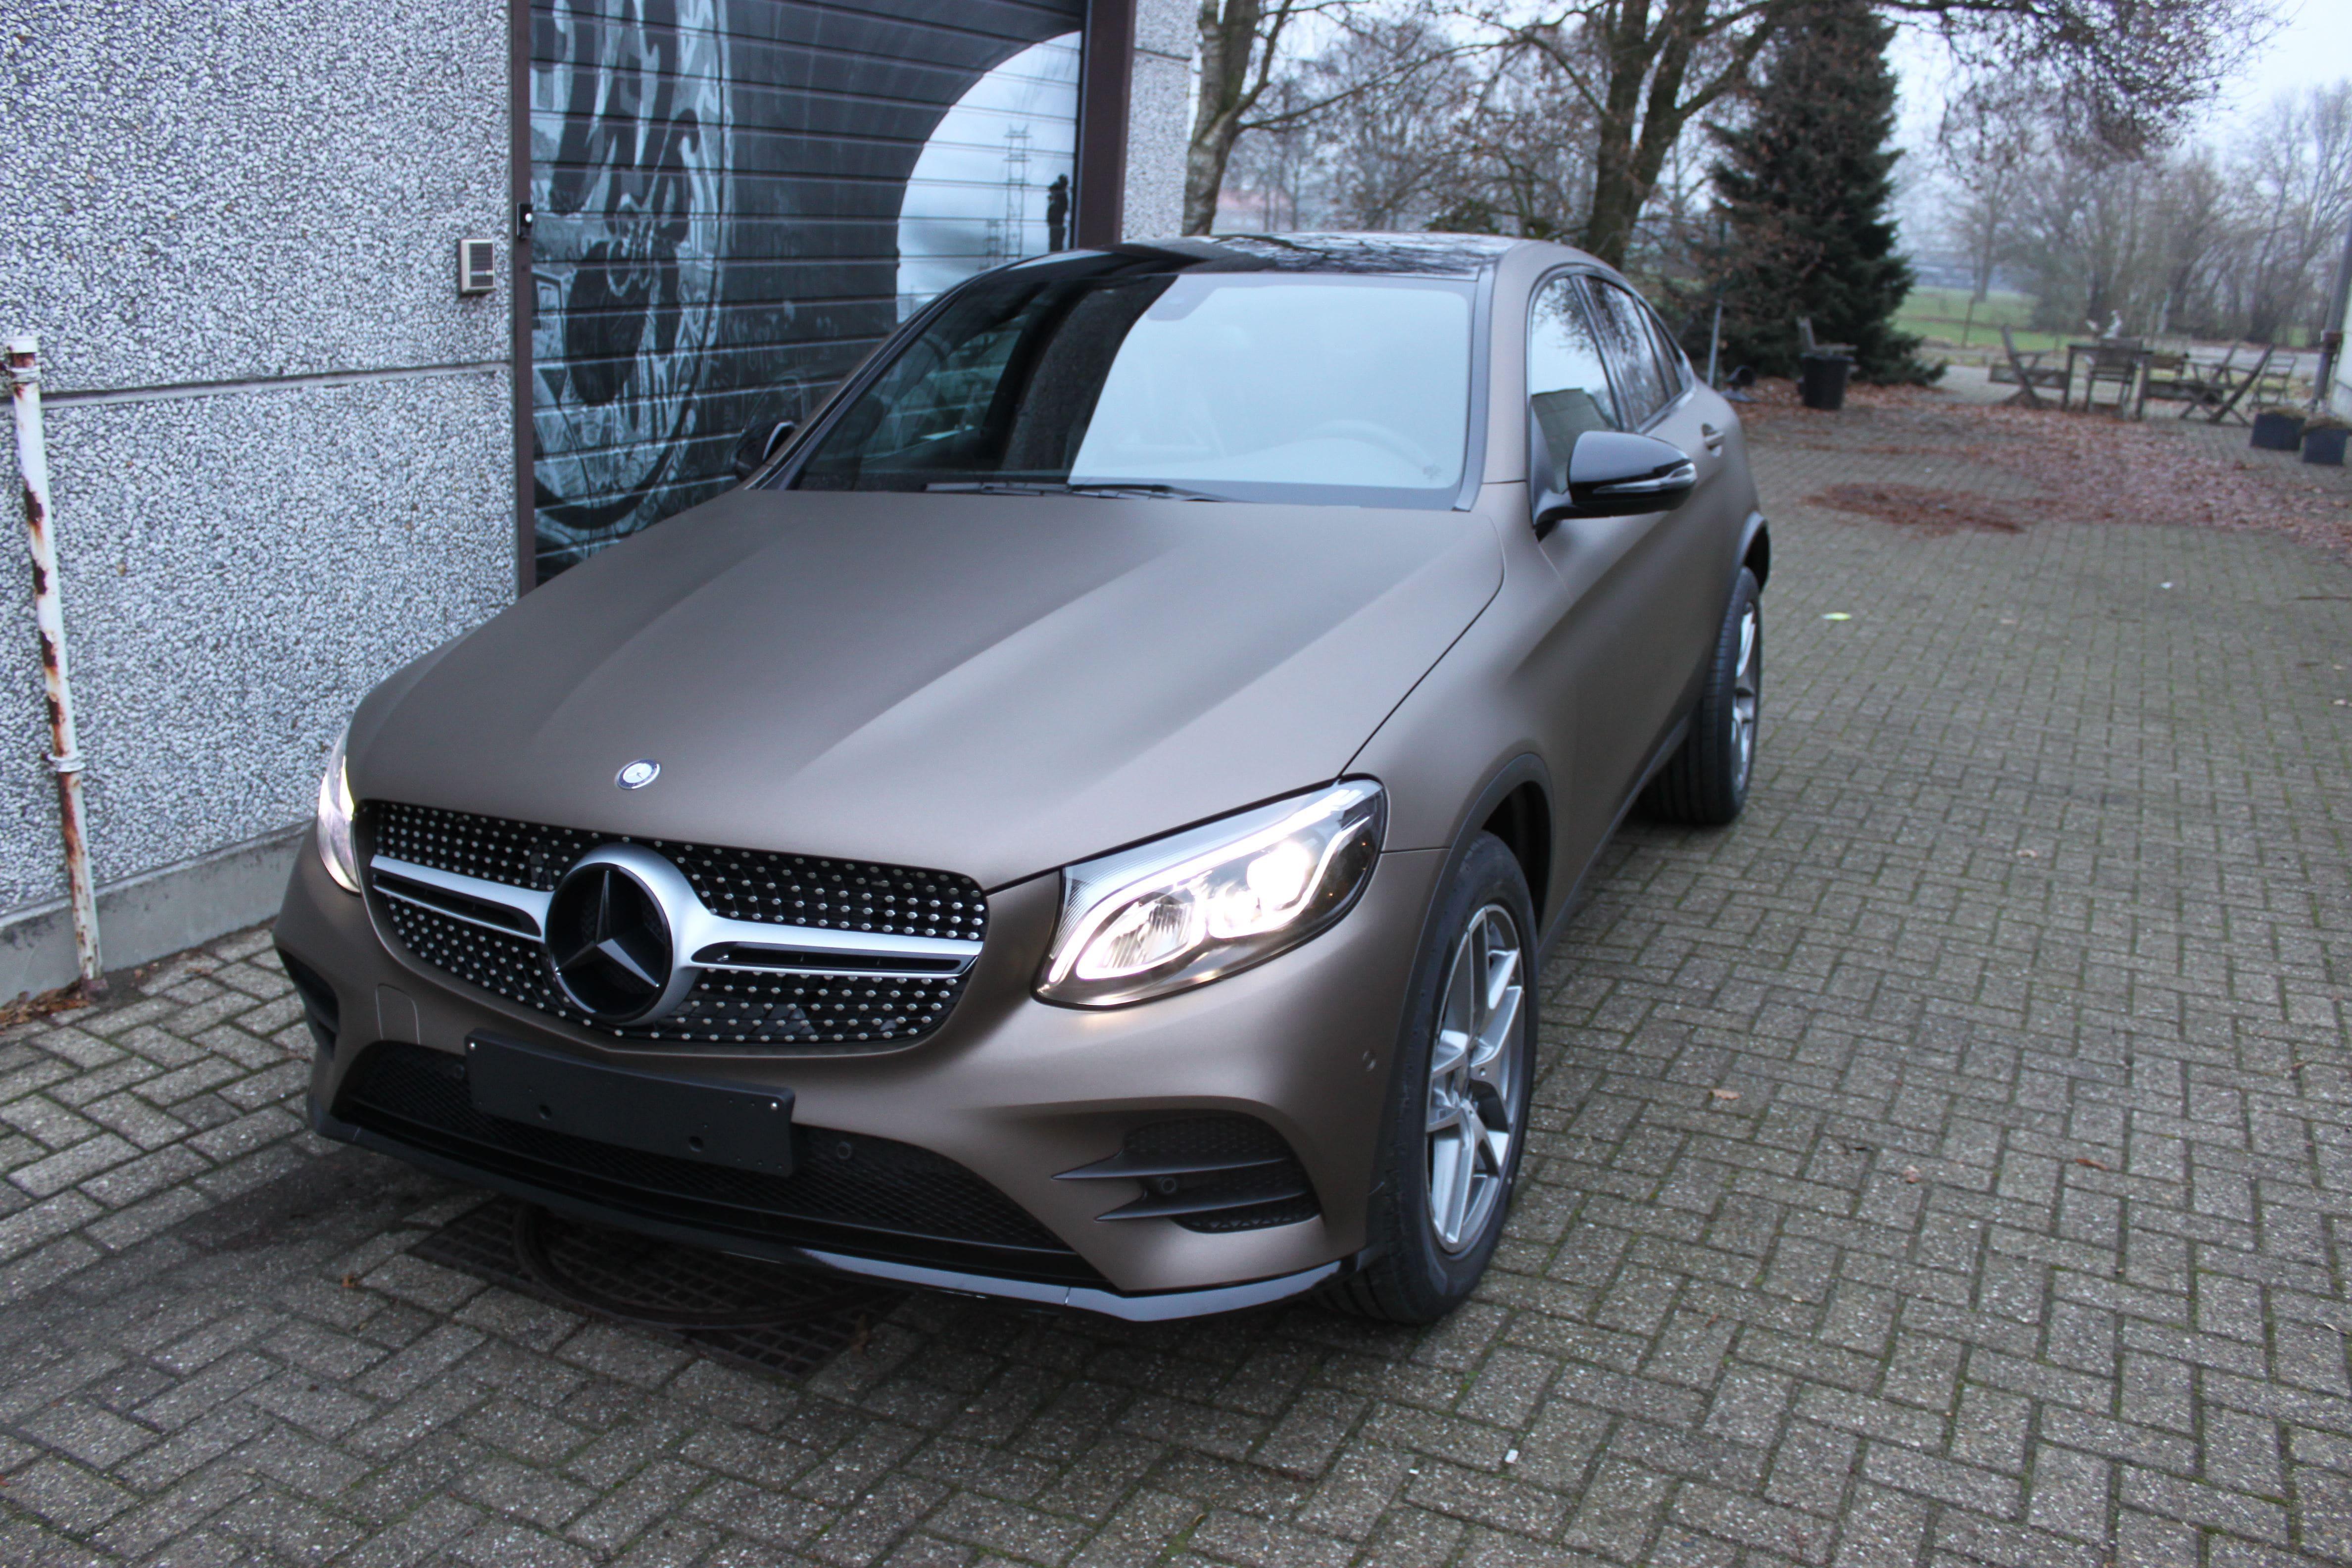 Mercedes GLC Coupe Matte metallic brown, Carwrapping door Wrapmyride.nu Foto-nr:9345, ©2021